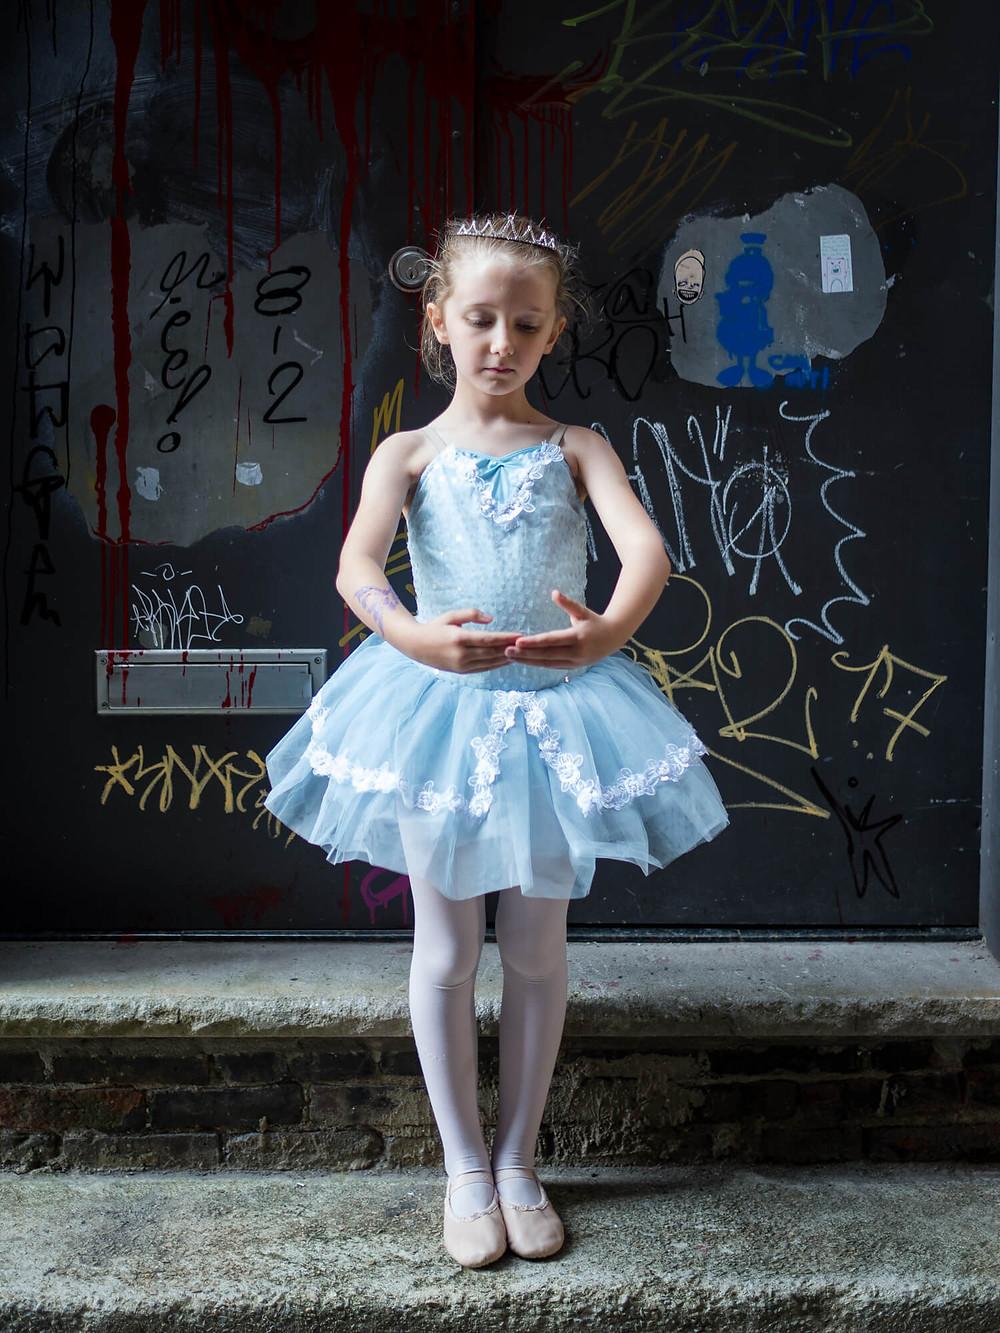 ballerina in front of graffiti